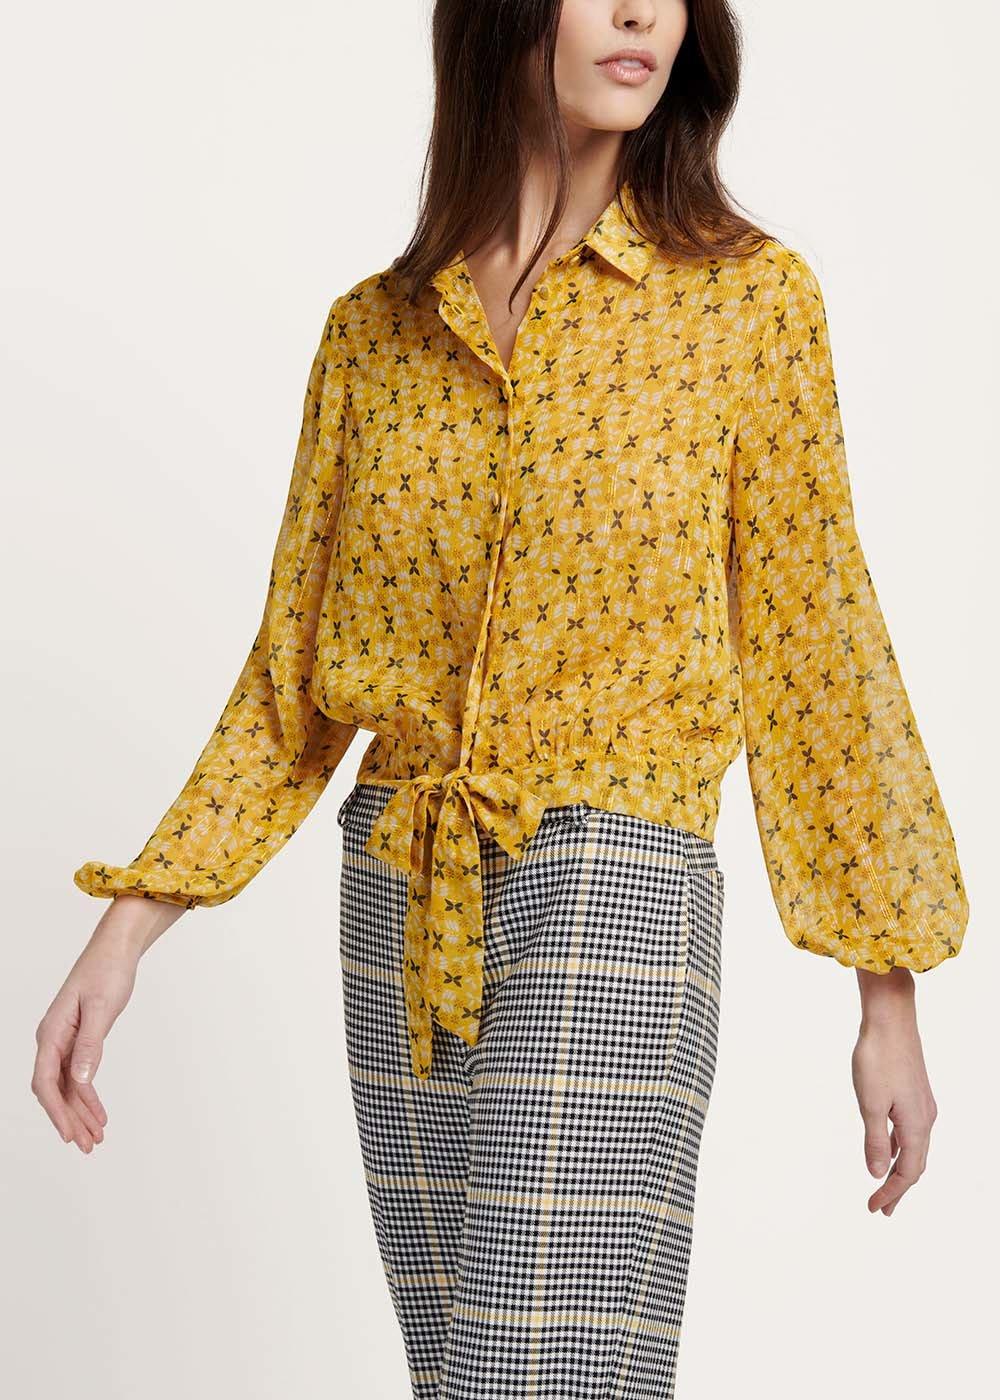 Cherry patterned shirt